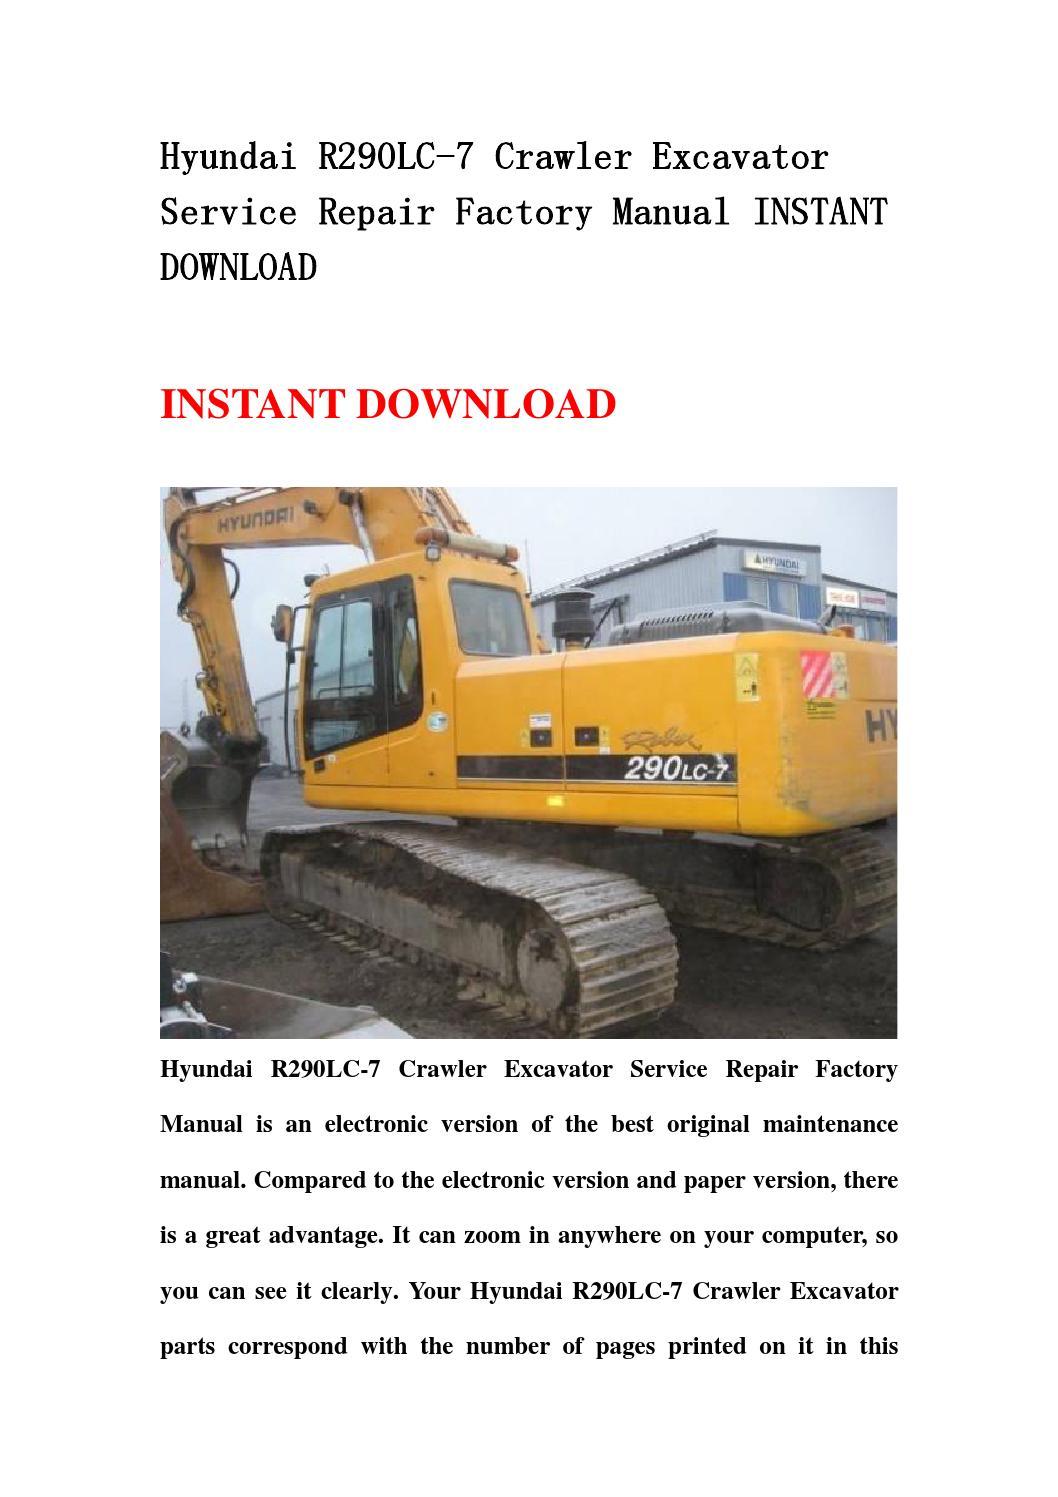 Hyundai R290lc 7 Crawler Excavator Service Repair Factory